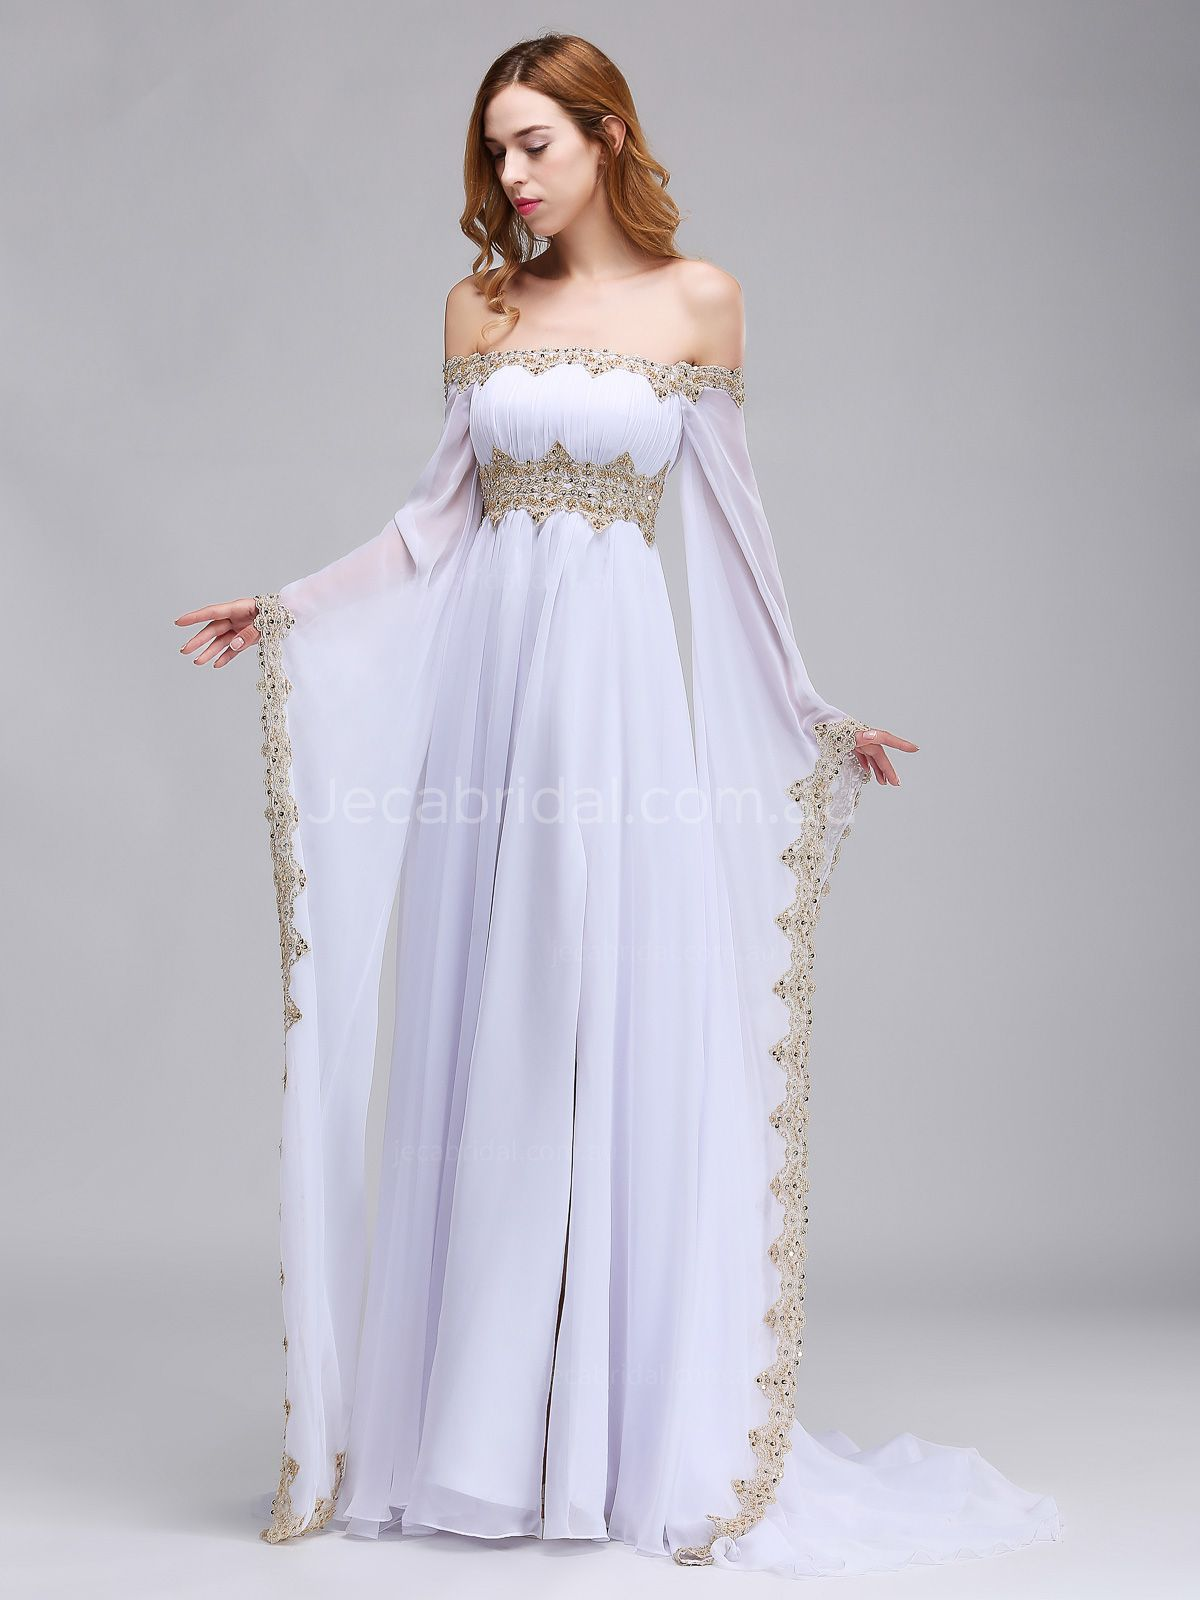 Off The Shoulder Medieval Wedding Dress W1064 Front 4: Cheap Meval Wedding Dresses At Websimilar.org